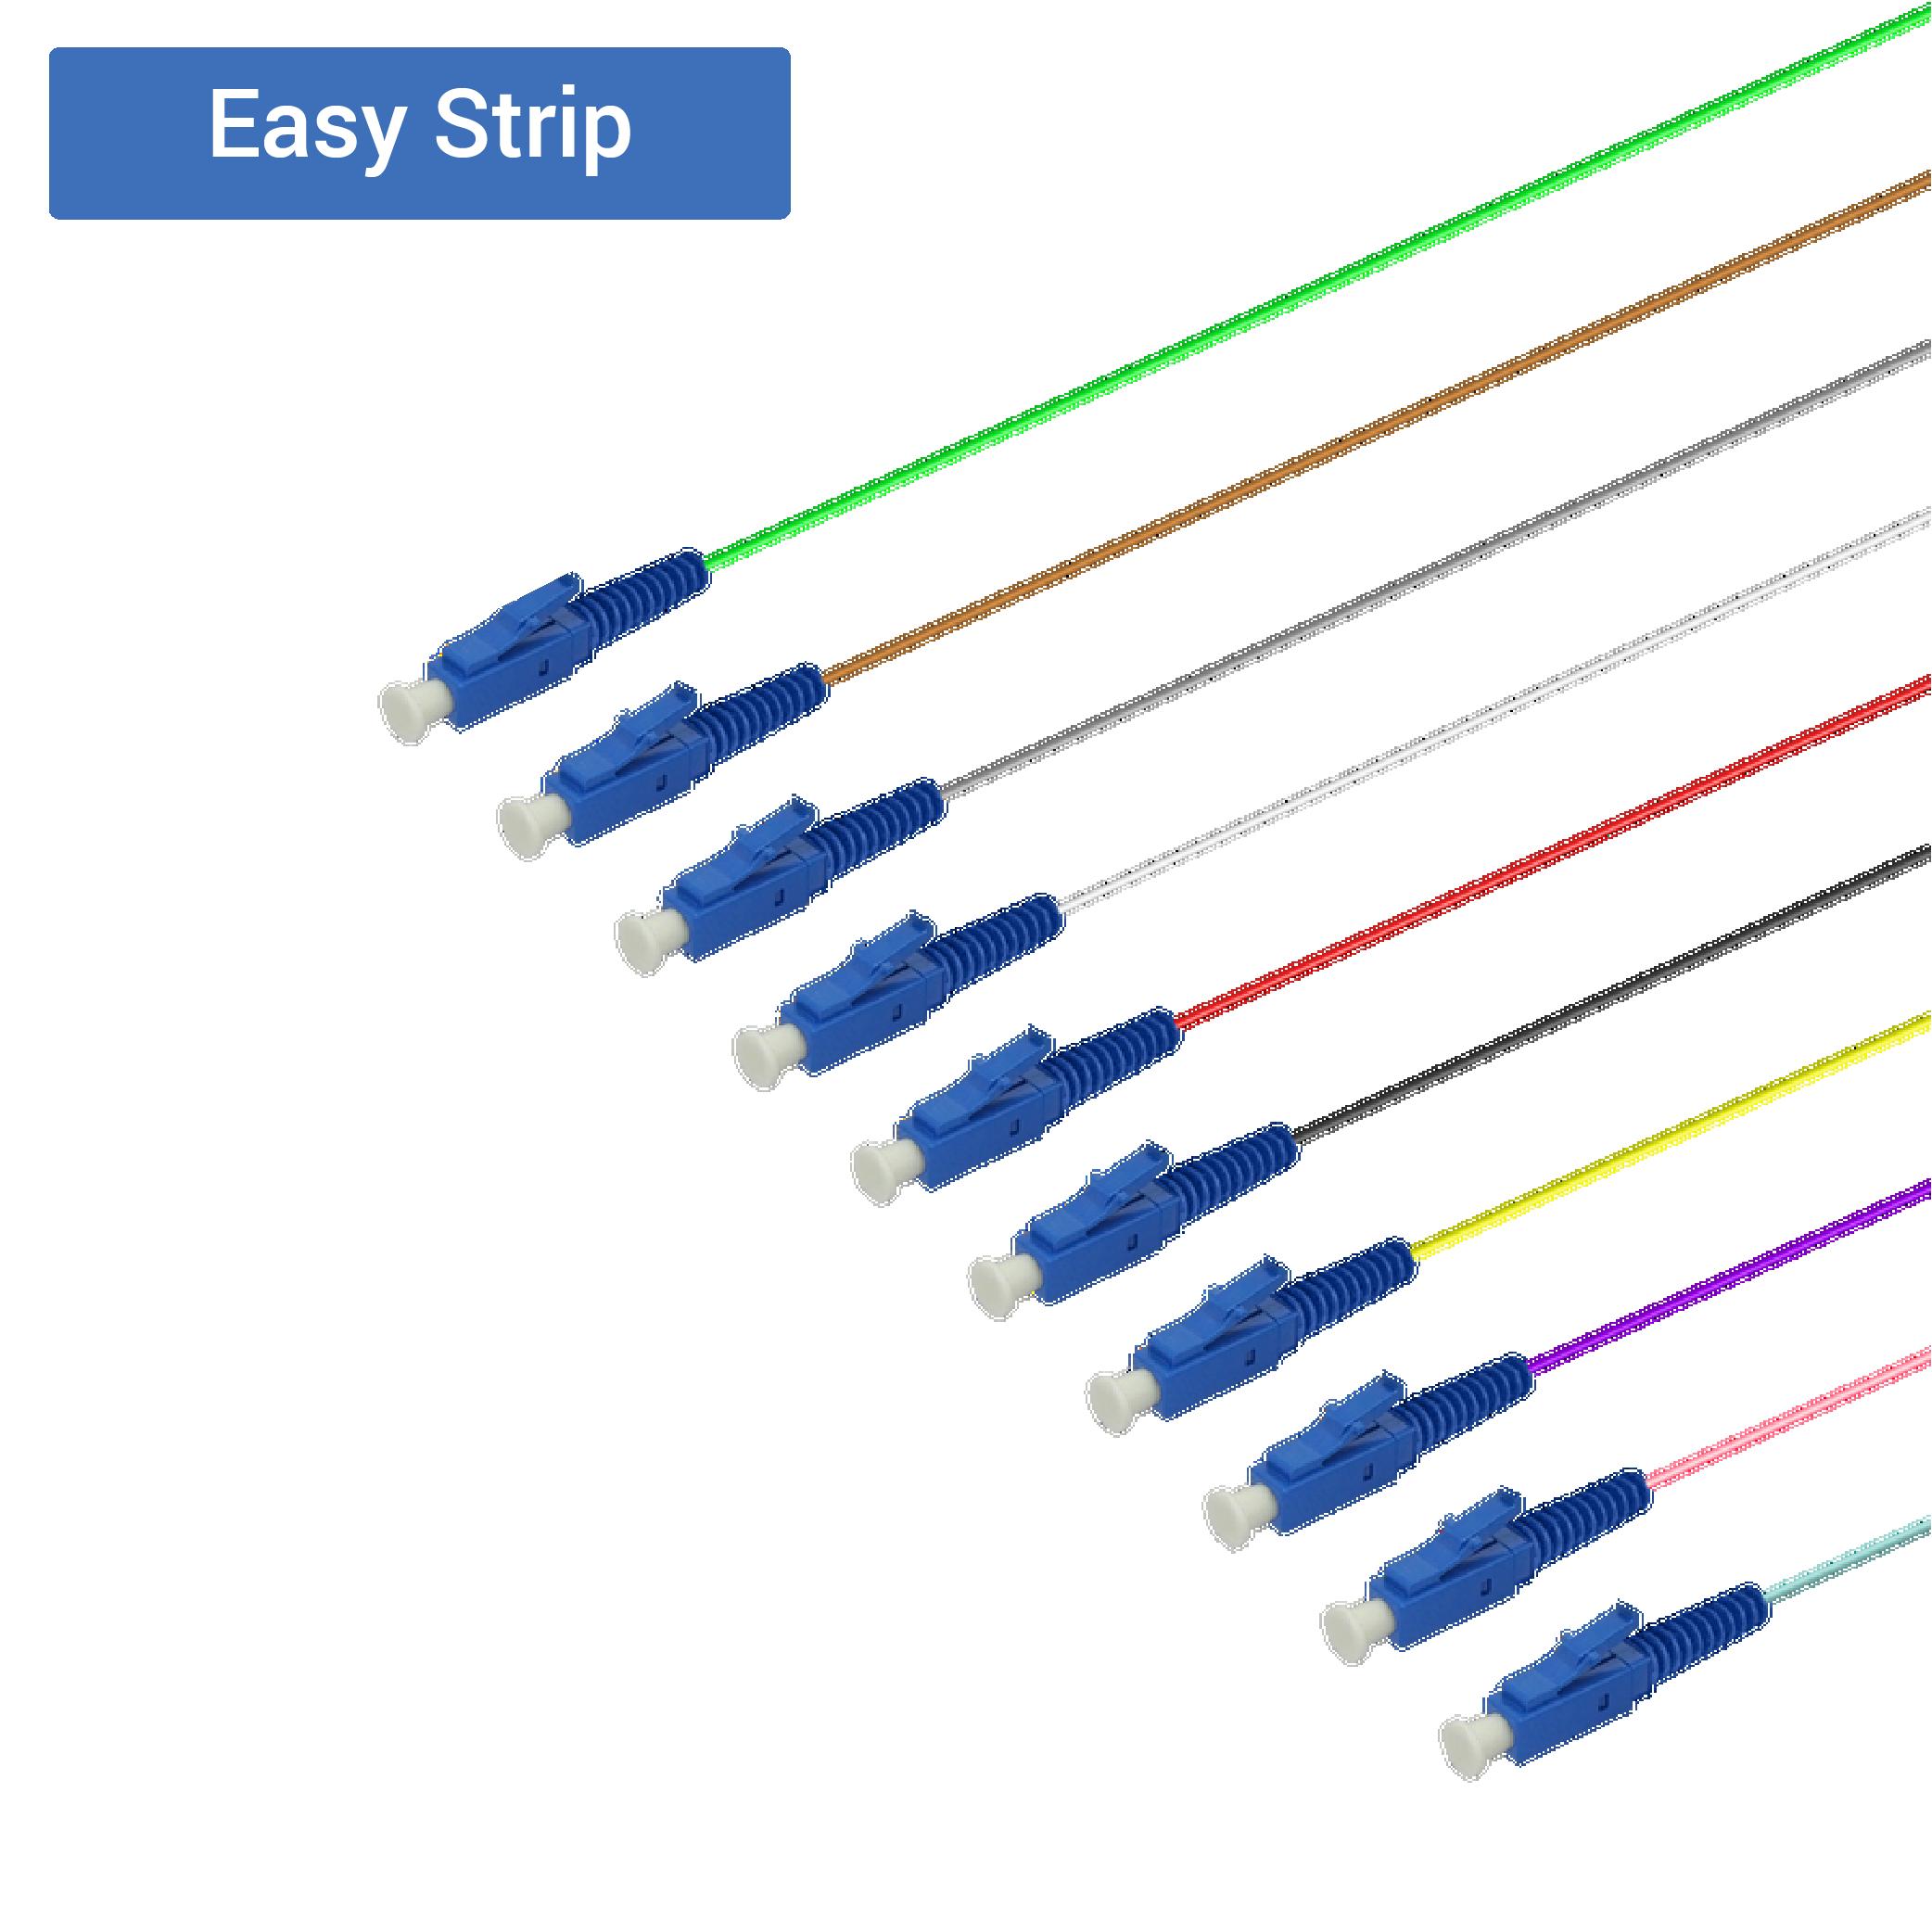 Samm Teknoloji - LC/UPC 12 Fiber Pigtail | Single Mode G657.A2 | 0.9mm